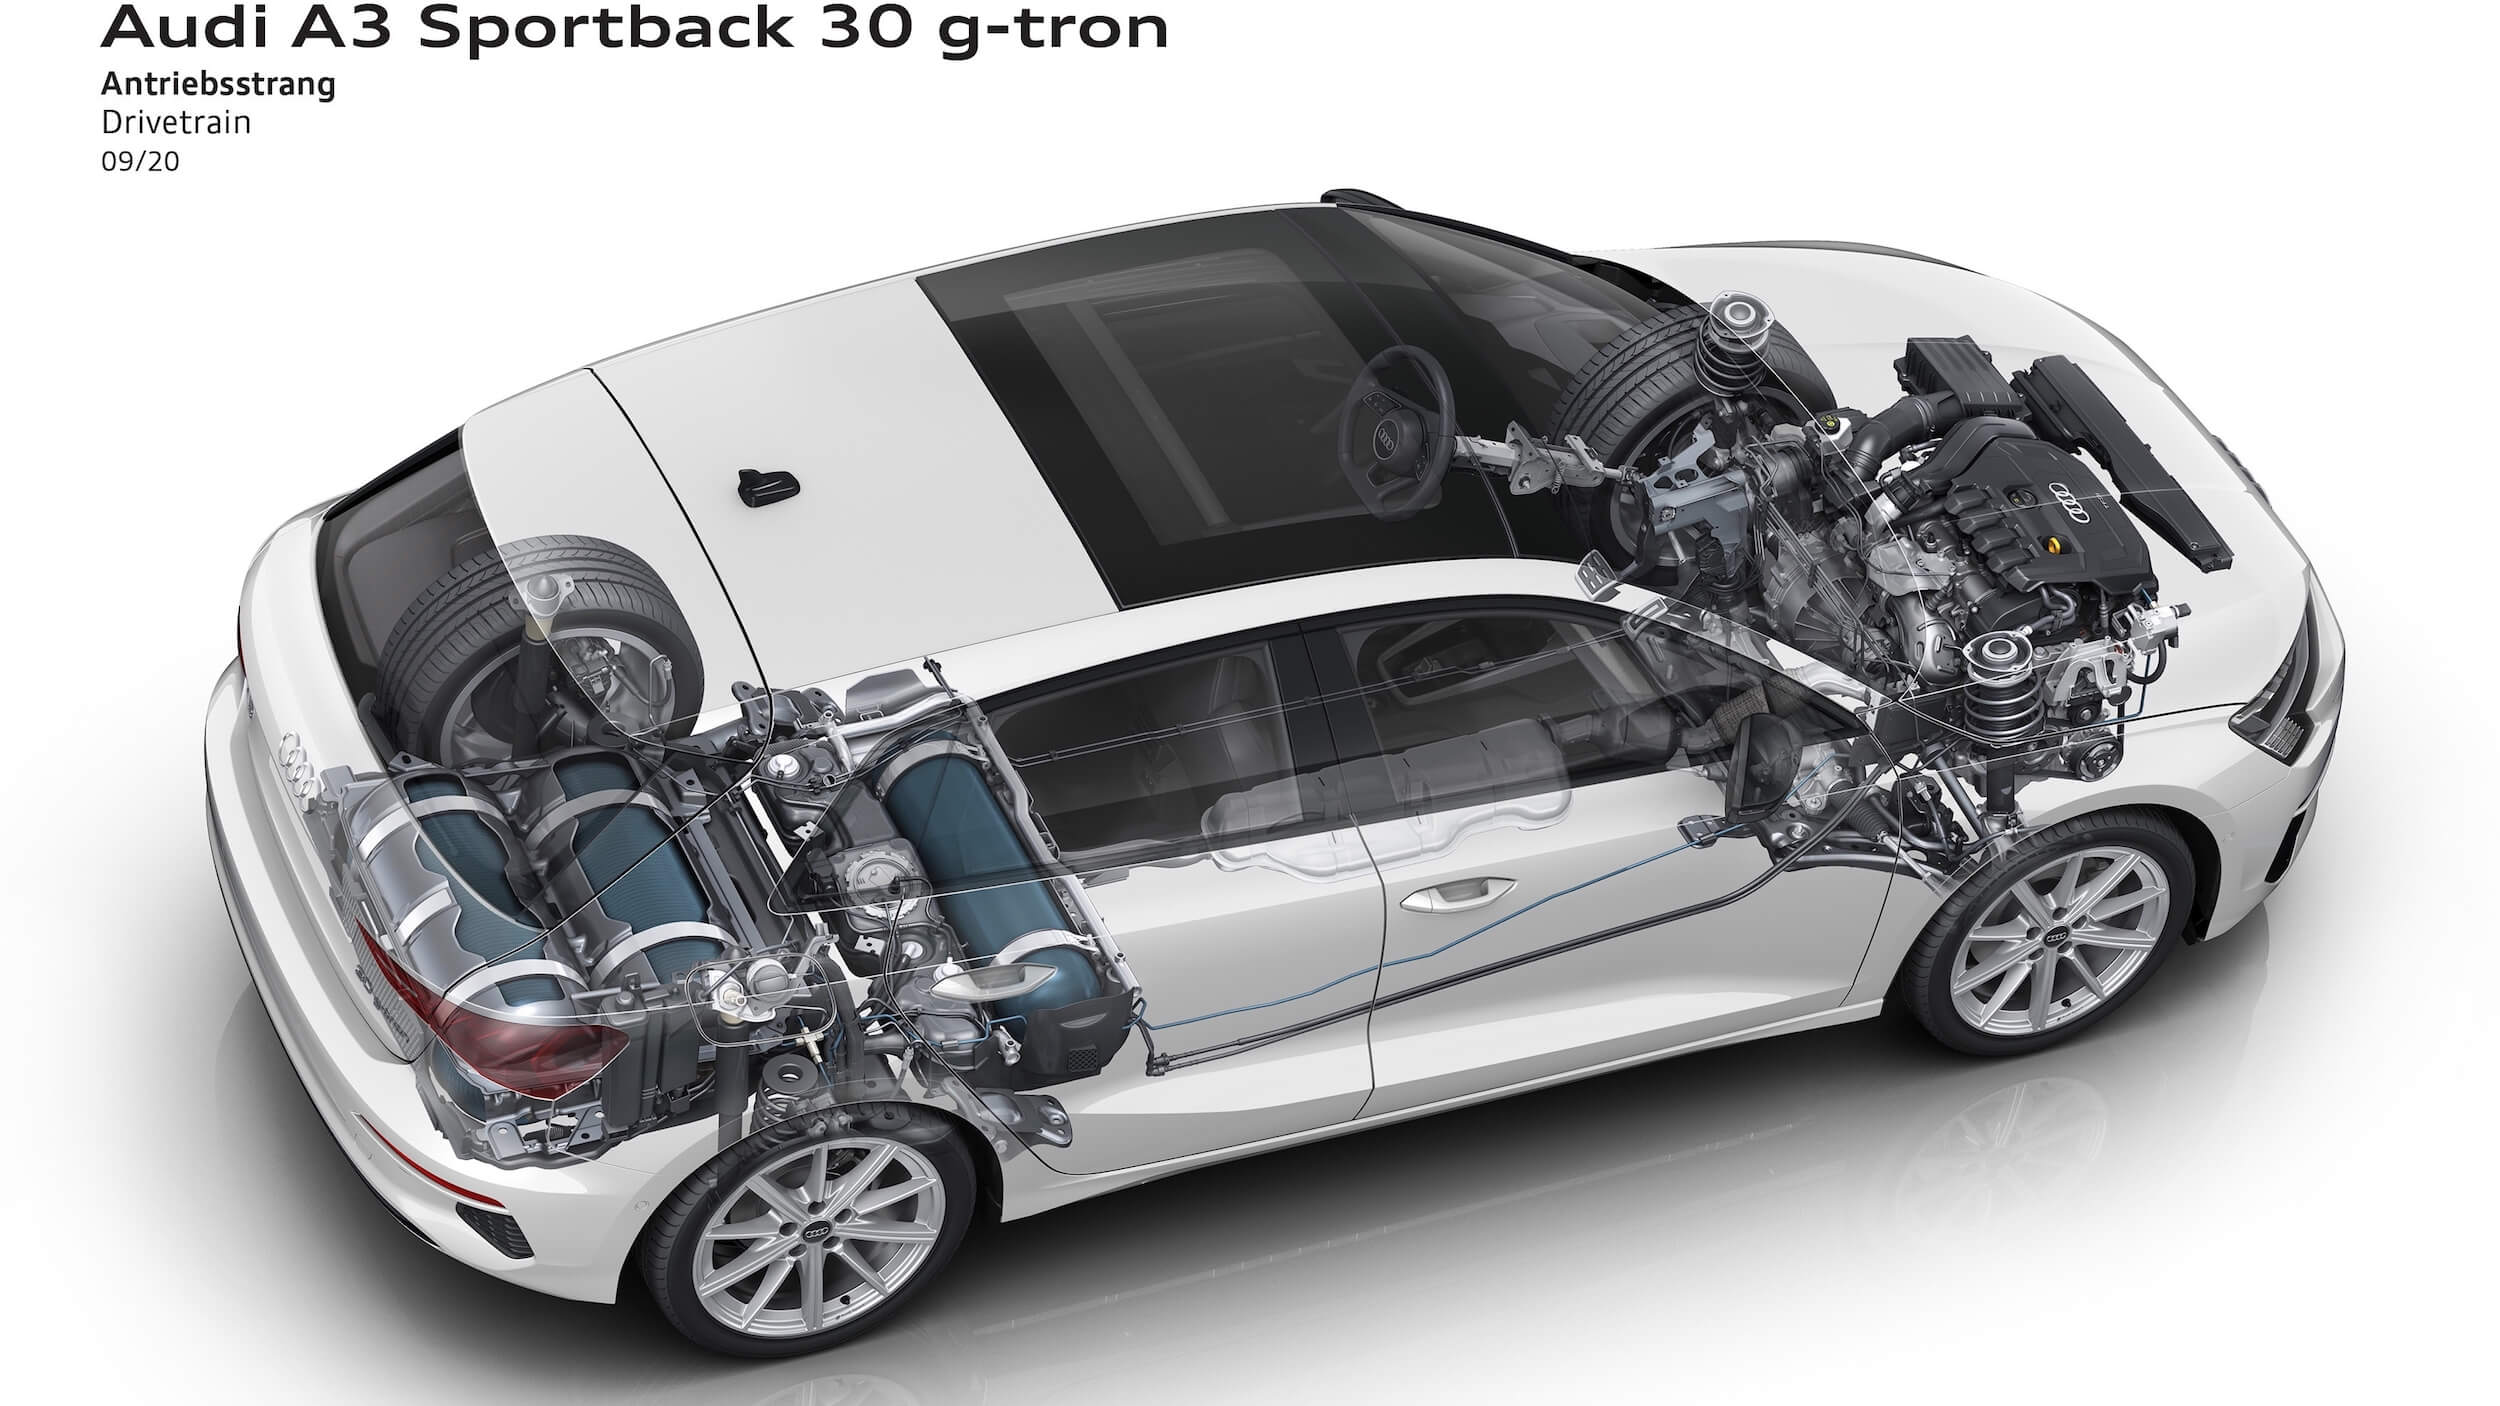 Audi A3 Sportback 30 g tron aandrijflijn